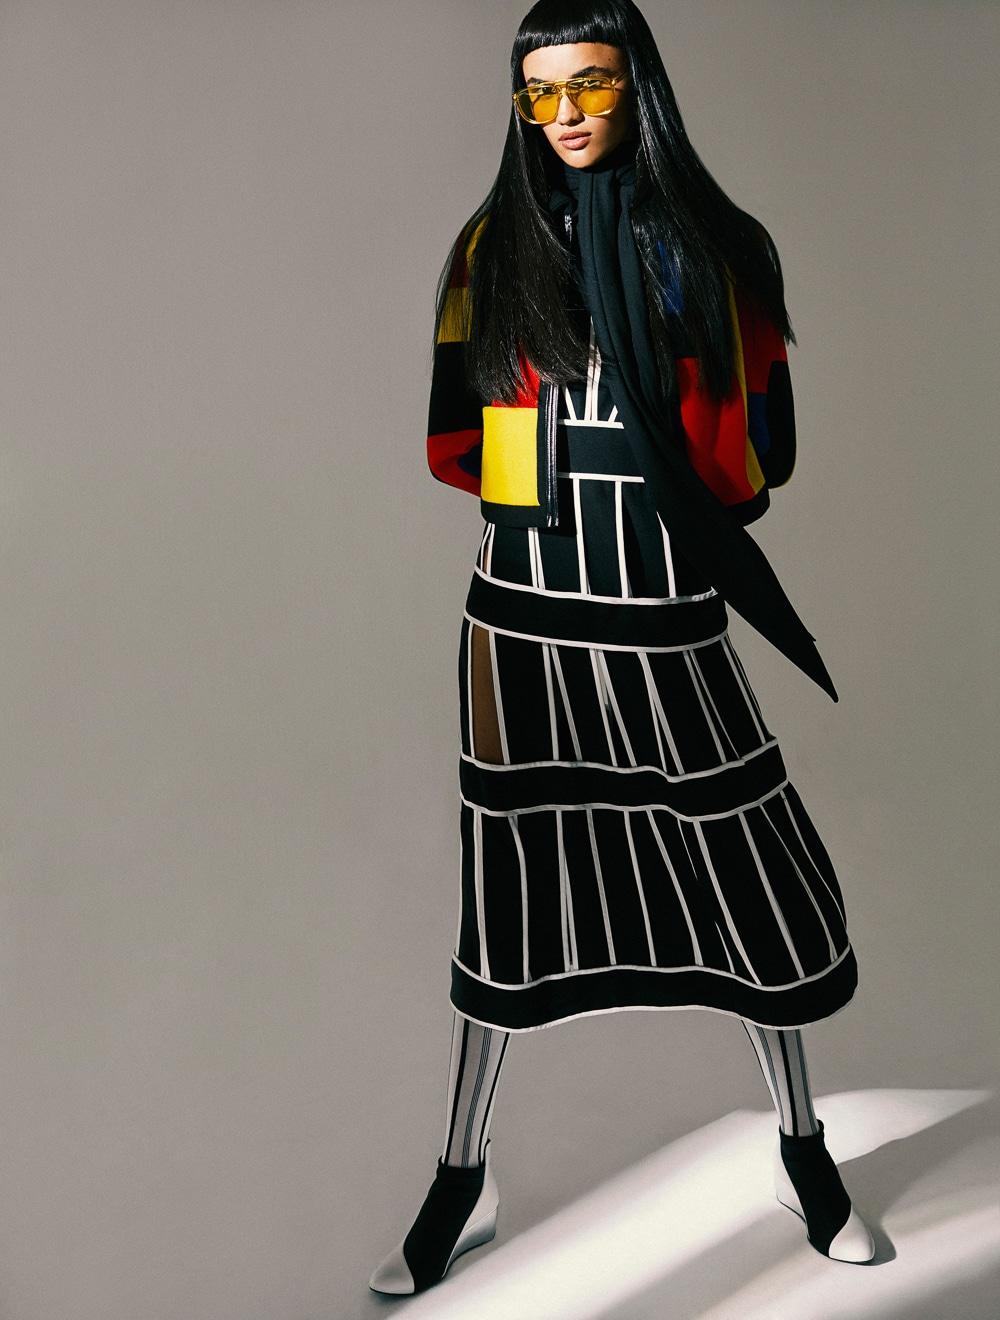 Harpers-Bazaar-Brazil-Cris-Lopes-Ivan-Erick-Menezes-7.jpg